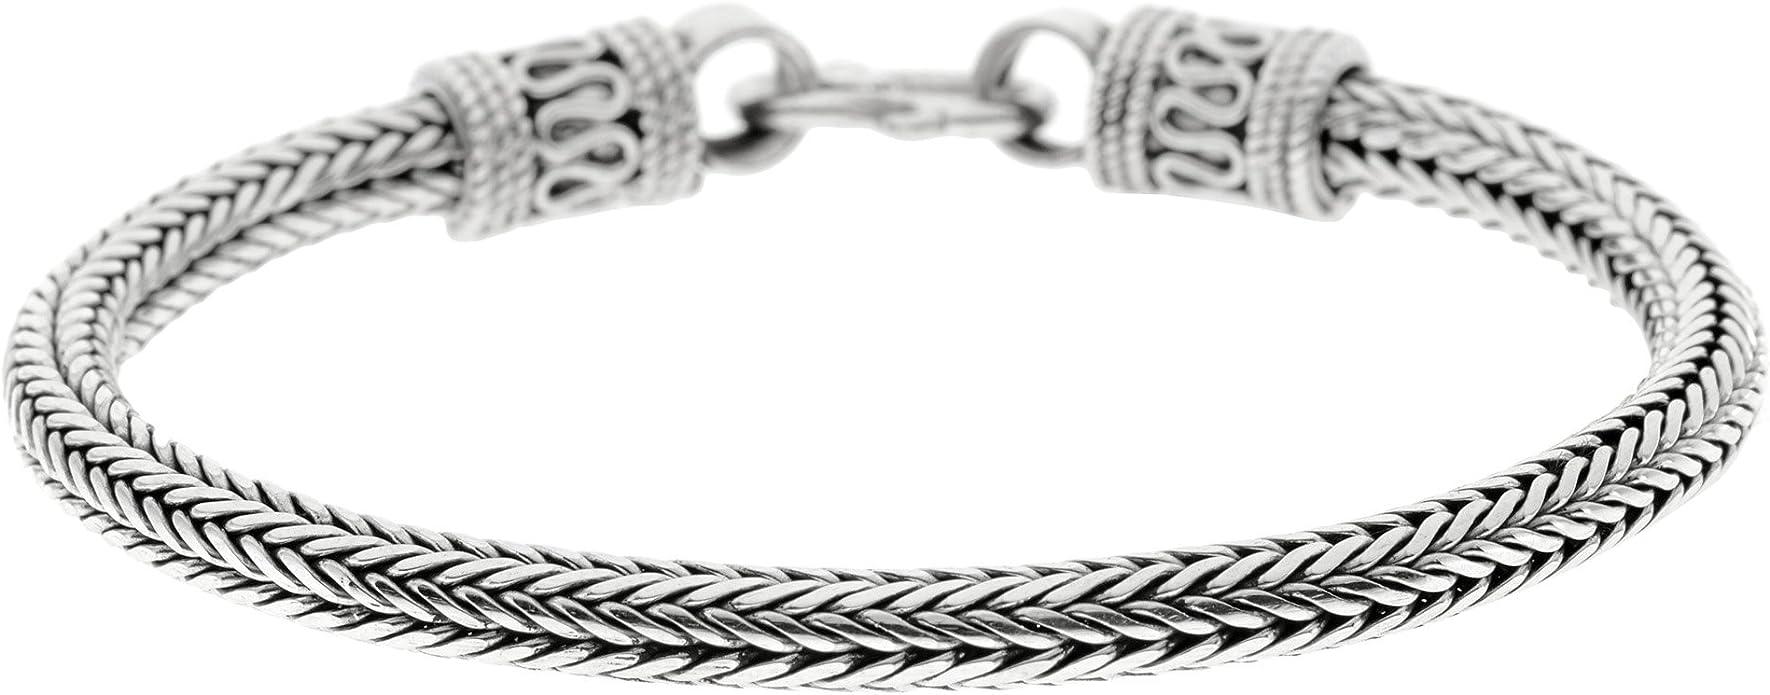 5 mm Argent Sterling Chaîne /& bracelets .925 Flexible serpent 2 mm